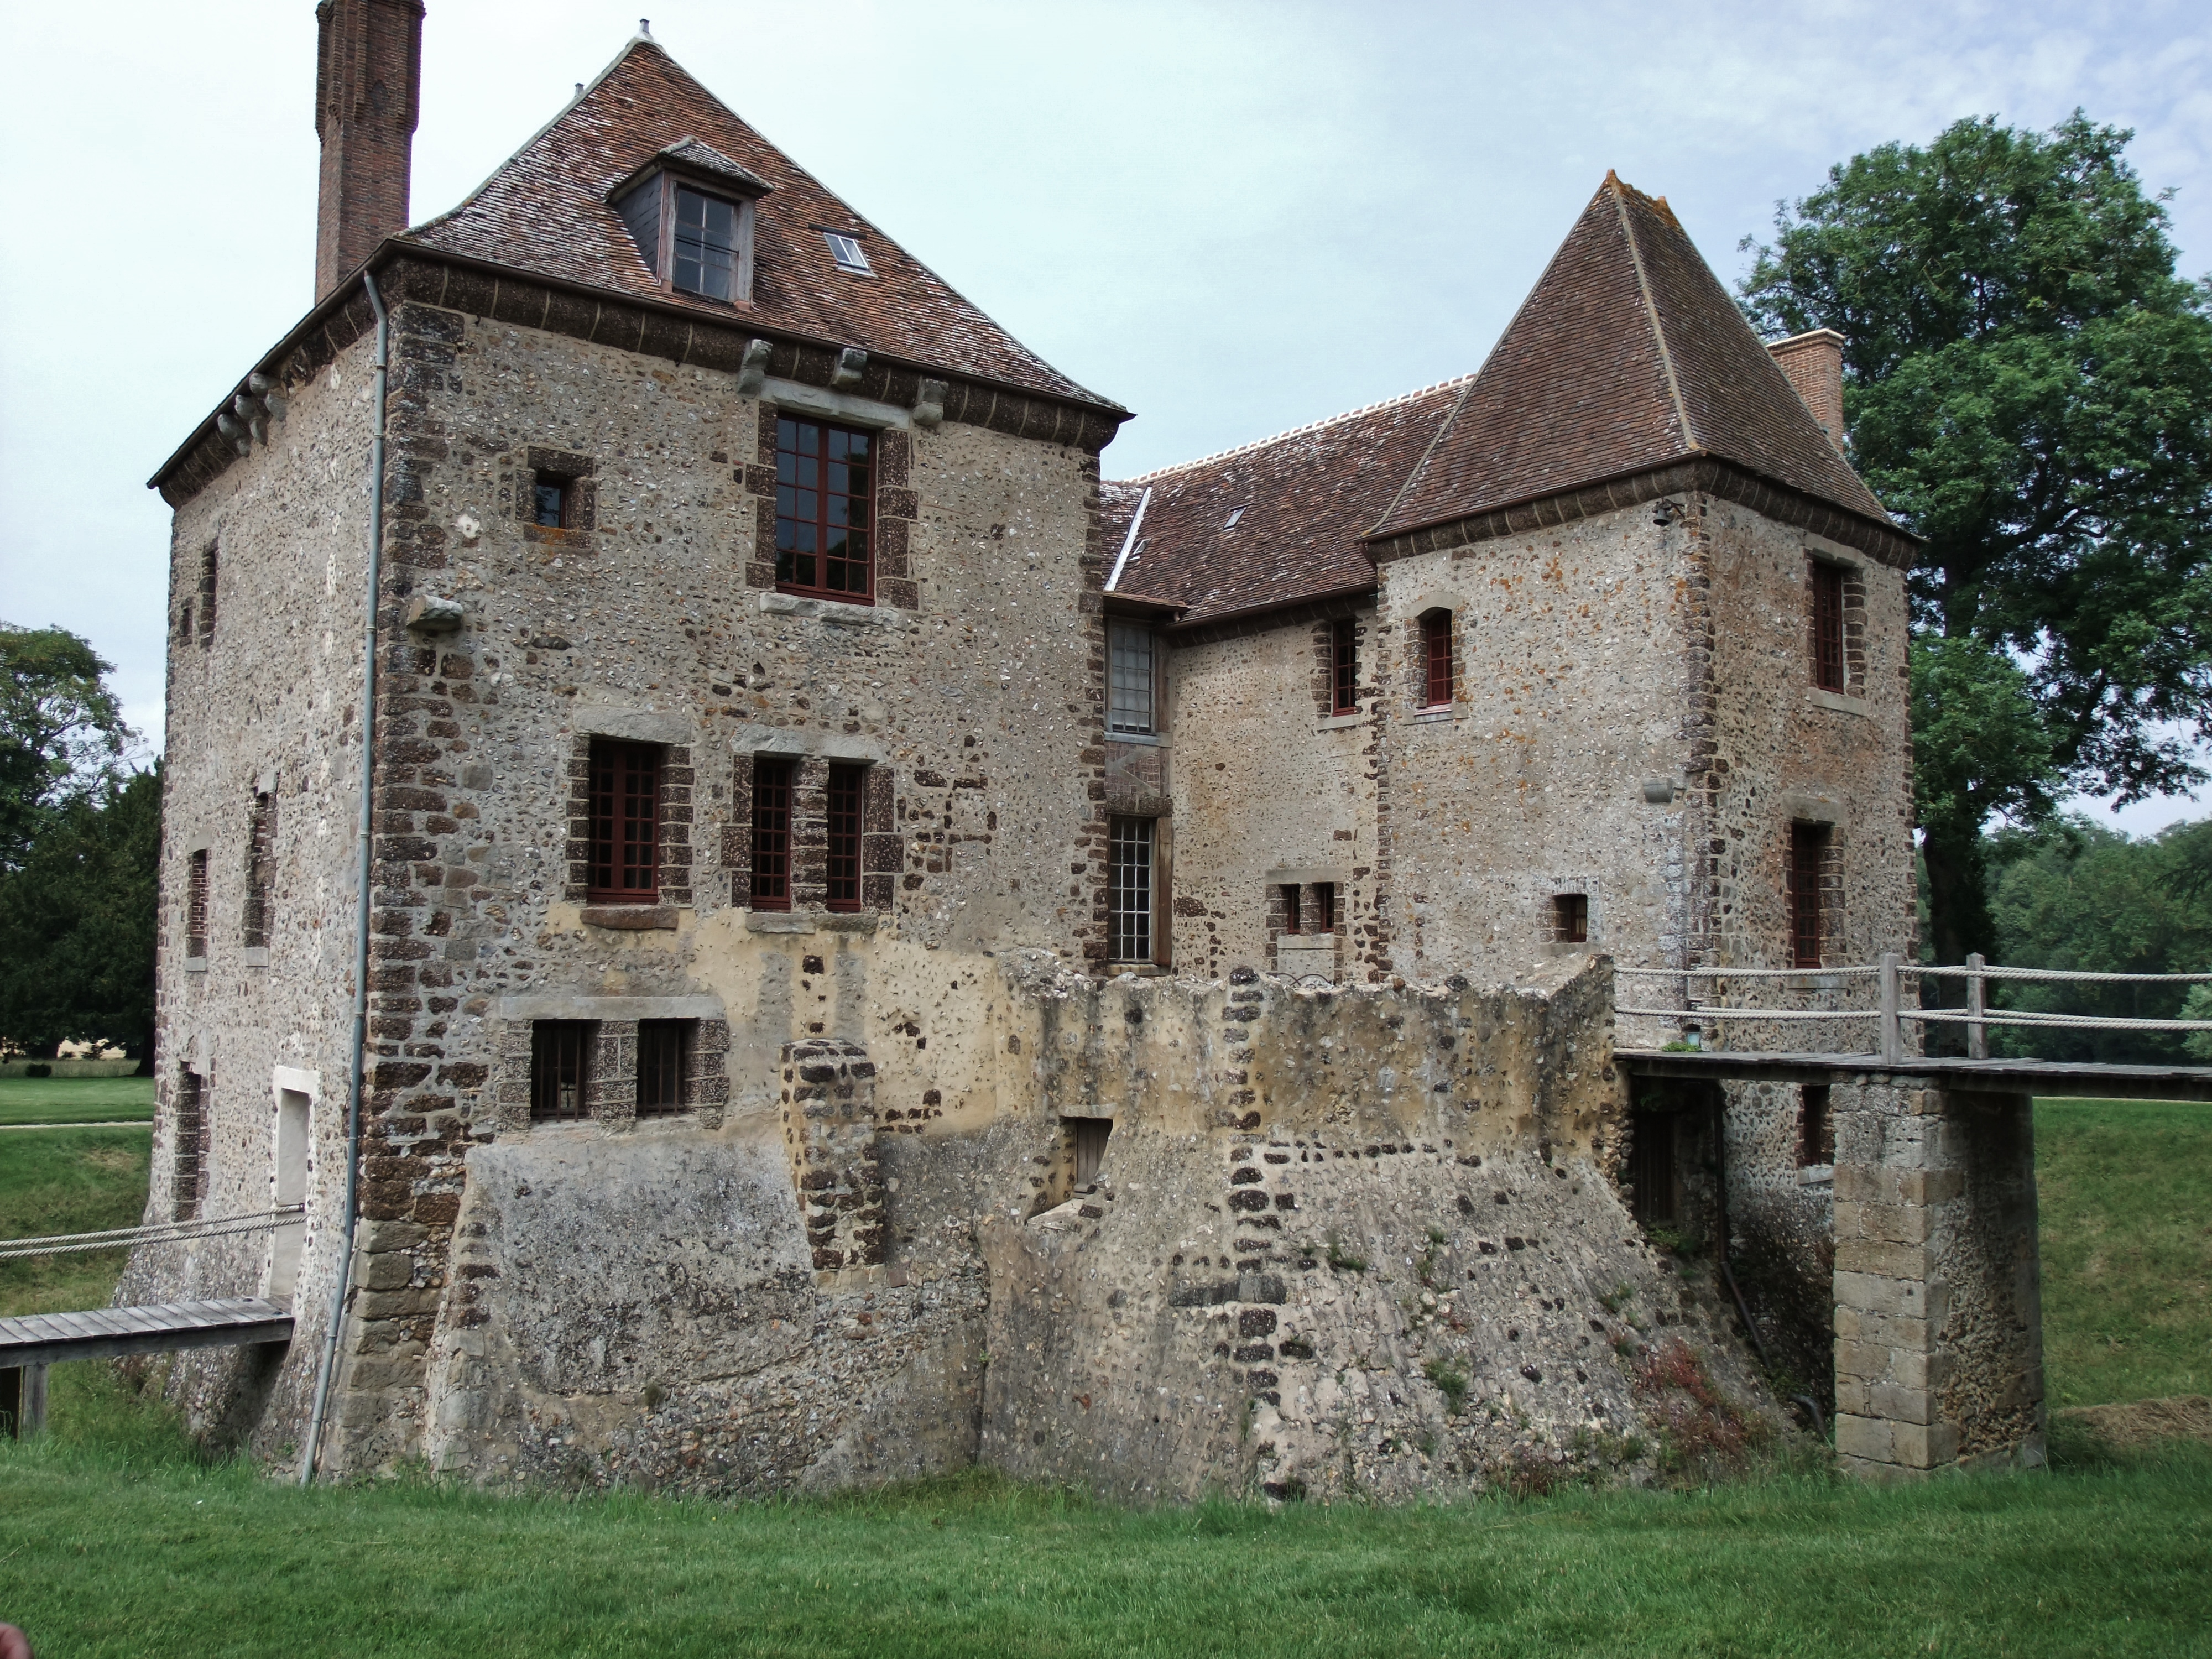 Château de la Gadelière - Château de la Gadelière